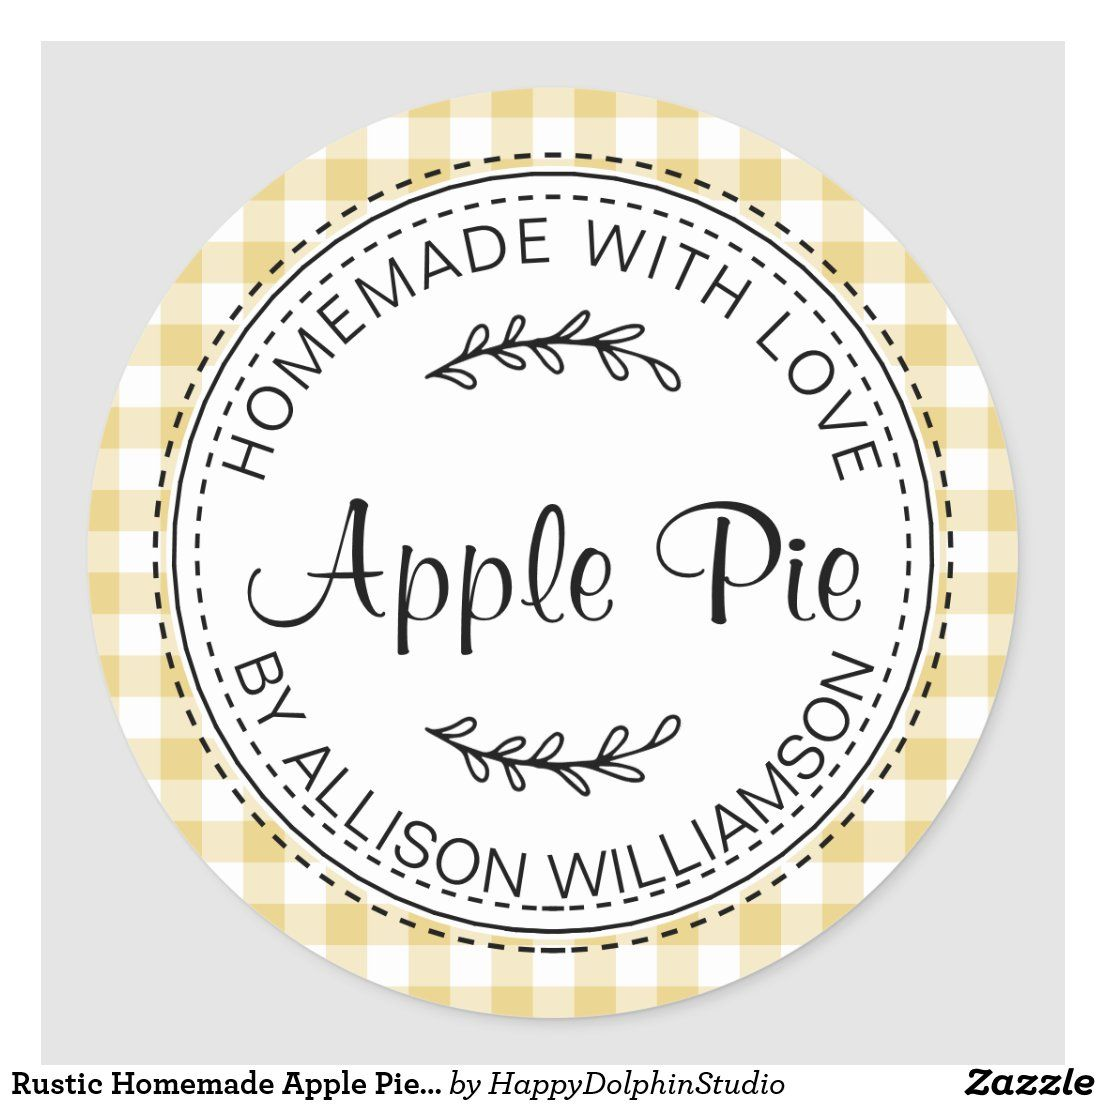 Rustic Homemade Apple Pie Yellow Check Classic Round Sticker Zazzle Com In 2021 Homemade Apple Homemade Apple Pies Apple Pie